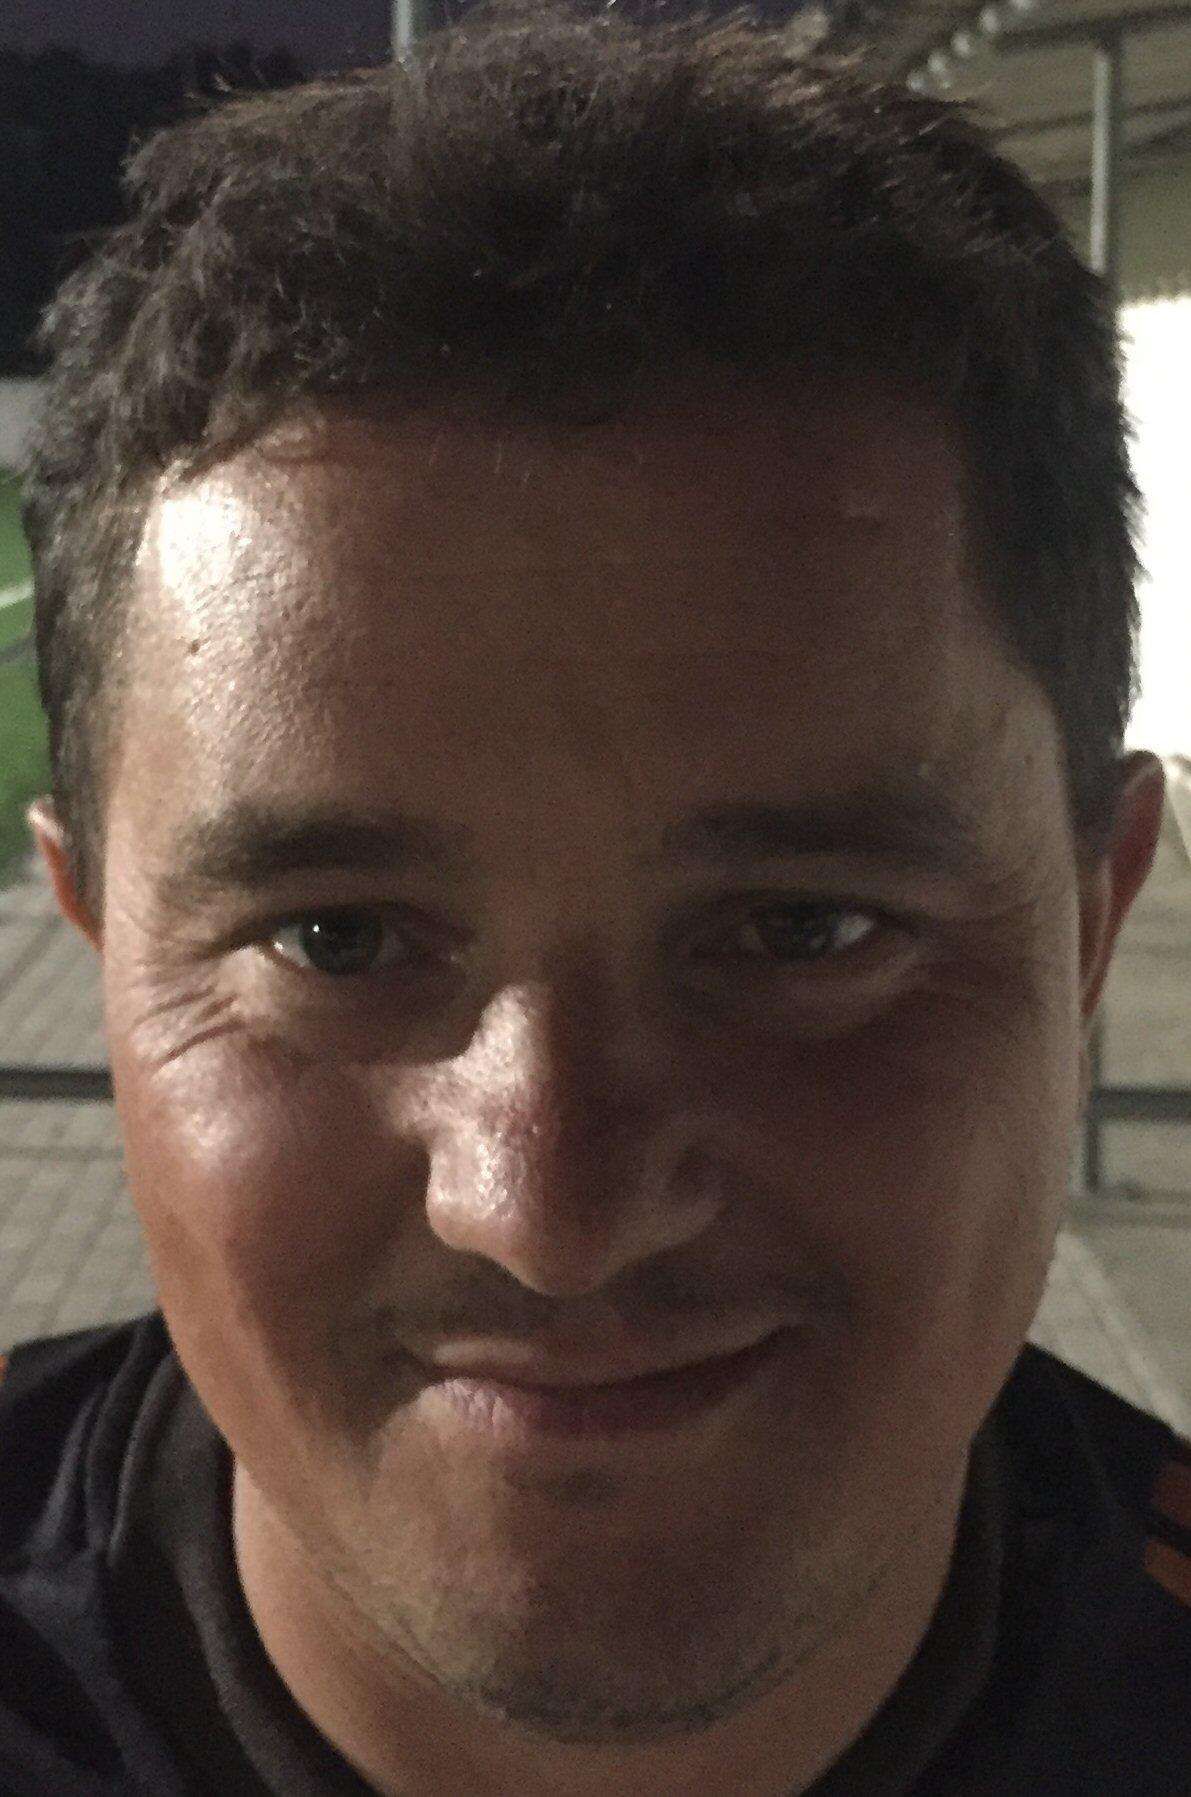 JOSÉ PATRICIO RIBEIRO FERREIRA